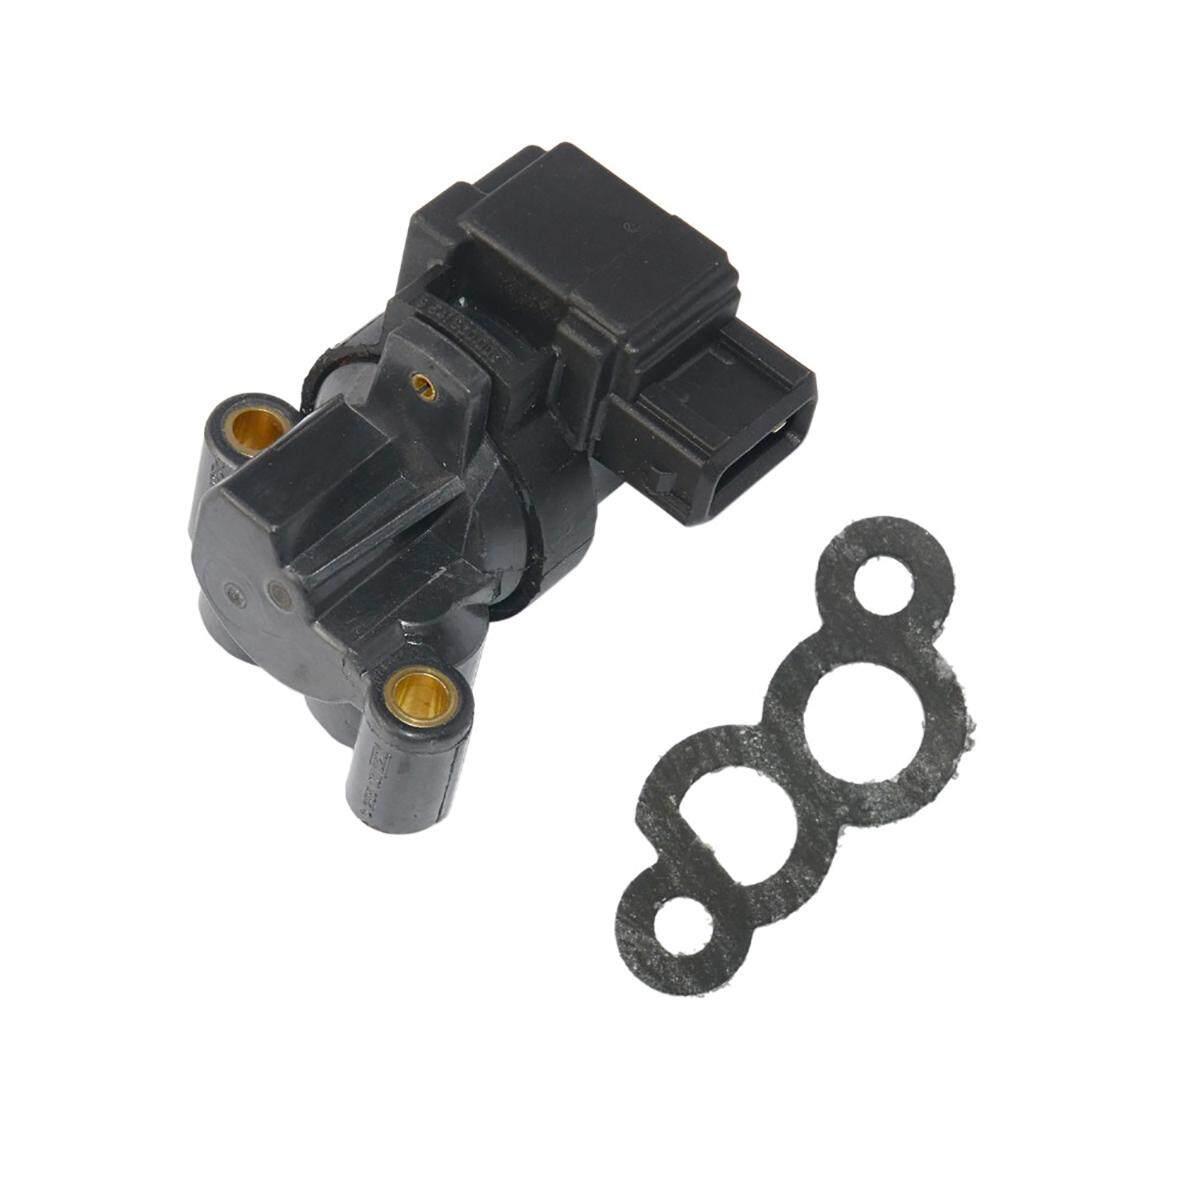 hight resolution of product details of idle air control valve iacv ac494 0280140575 for bmw e34 e36 e46 oe 0280140575